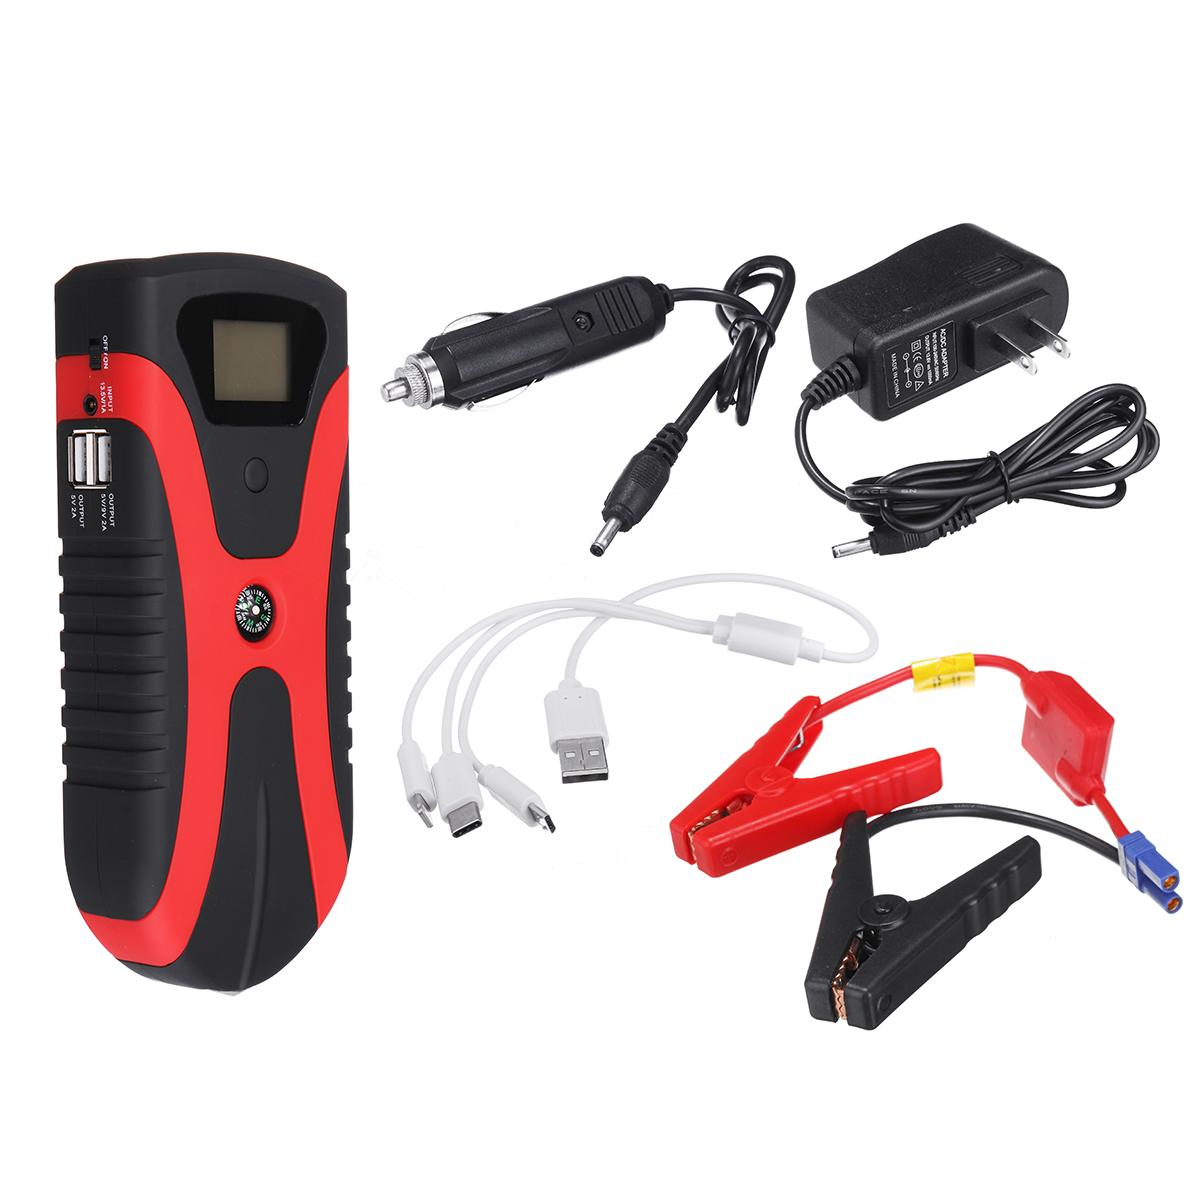 180A Tragbare Multi Funktion Power Auto Starthilfe Notfall Licht Tragbare Auto Batterie Booster Ladegerät Mit USB schnelle lade - 2